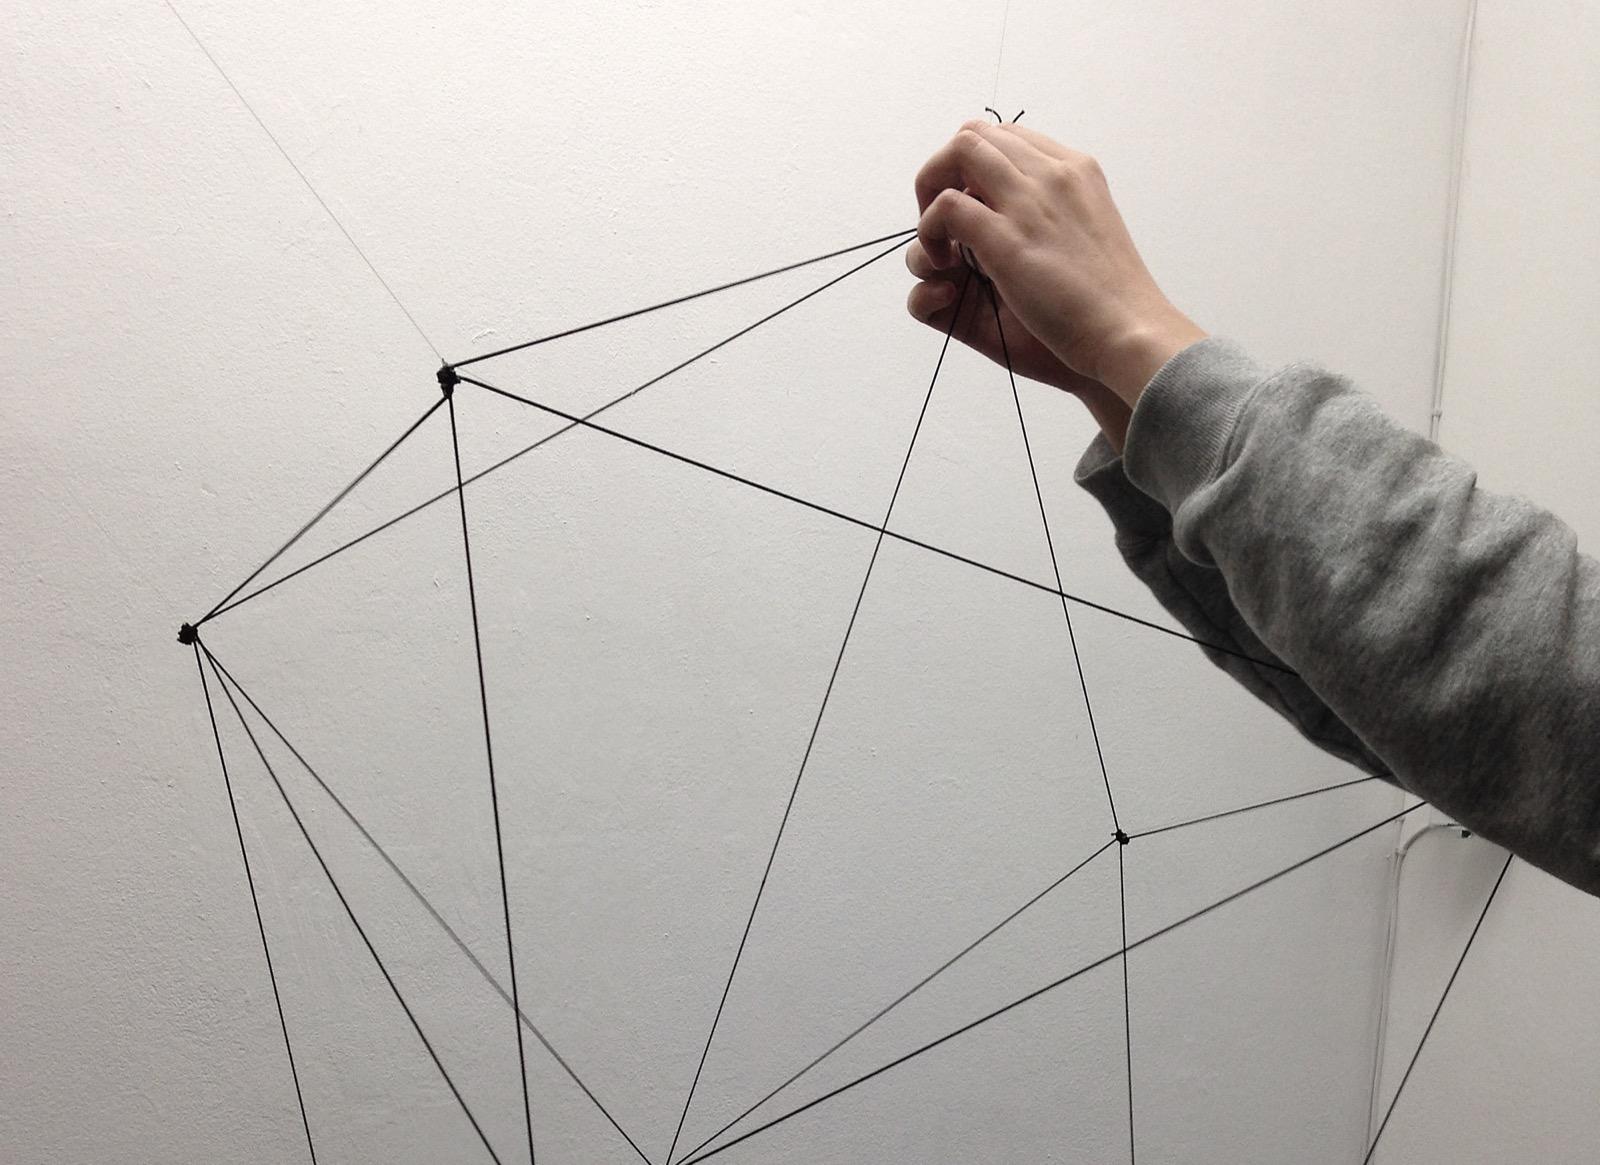 iregular-polyhedron_images_07